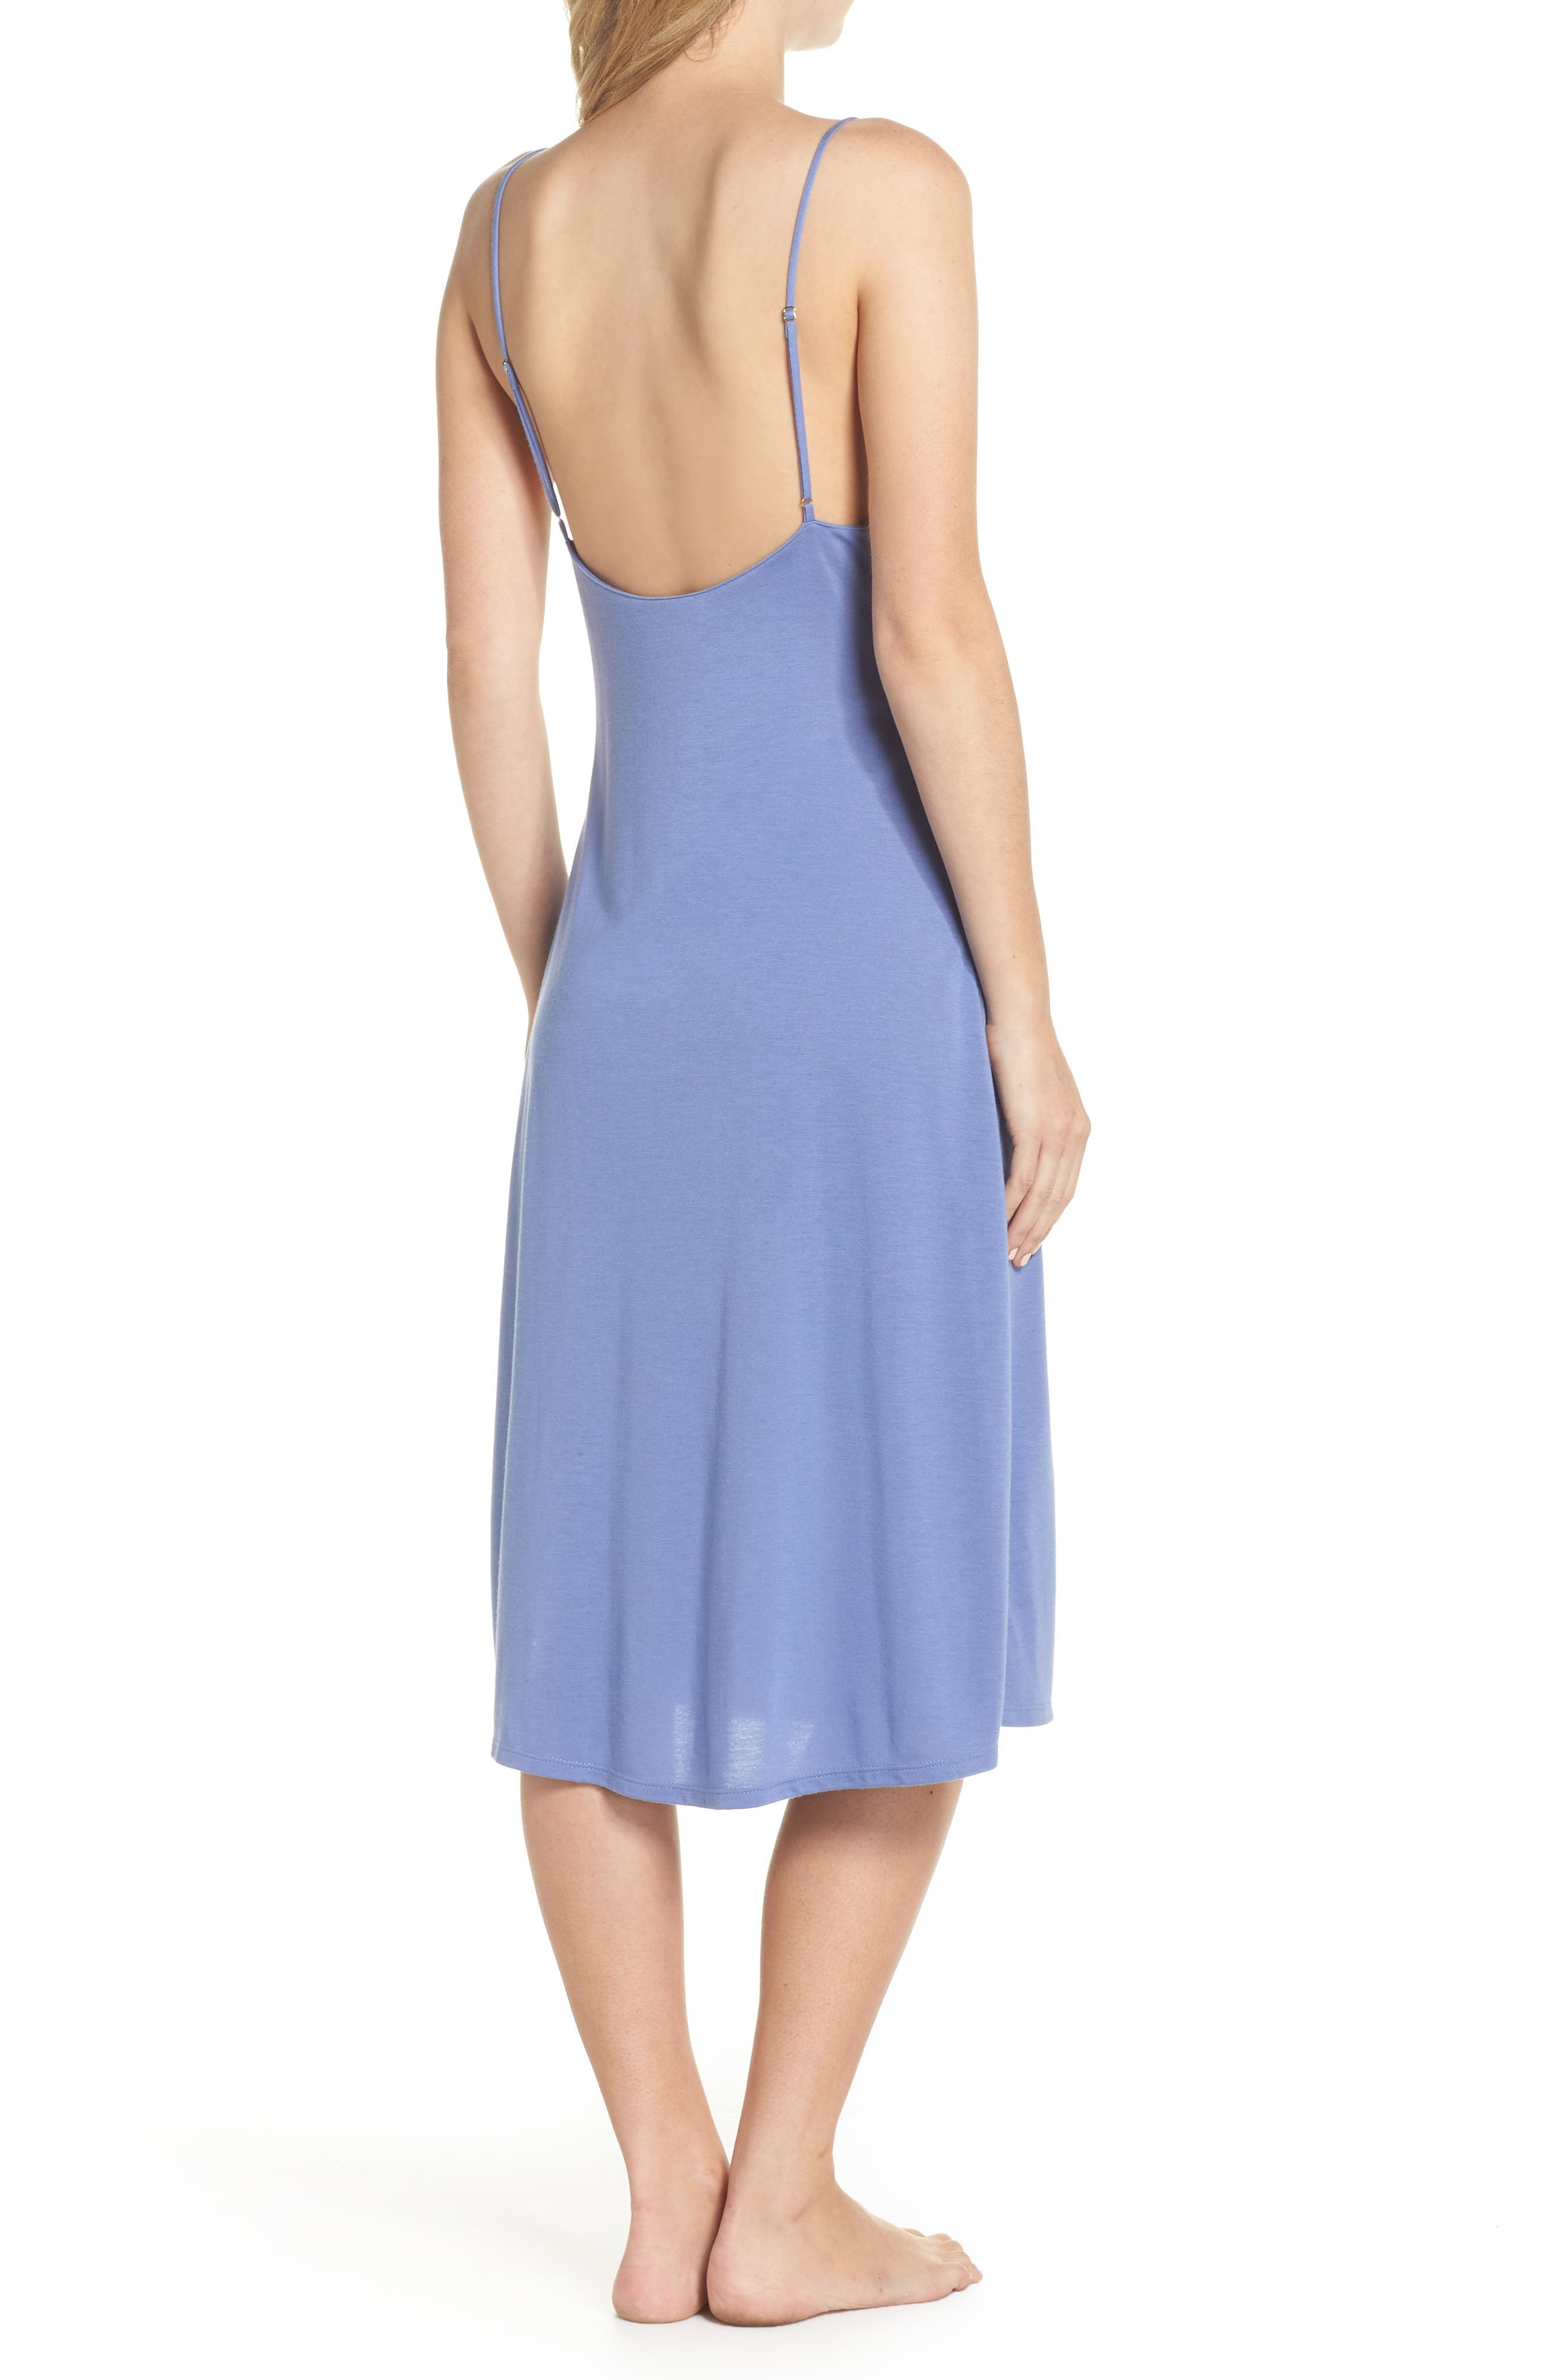 Luxe Shangri-La Nightgown,                             Alternate thumbnail 2, color,                             Wedgewood